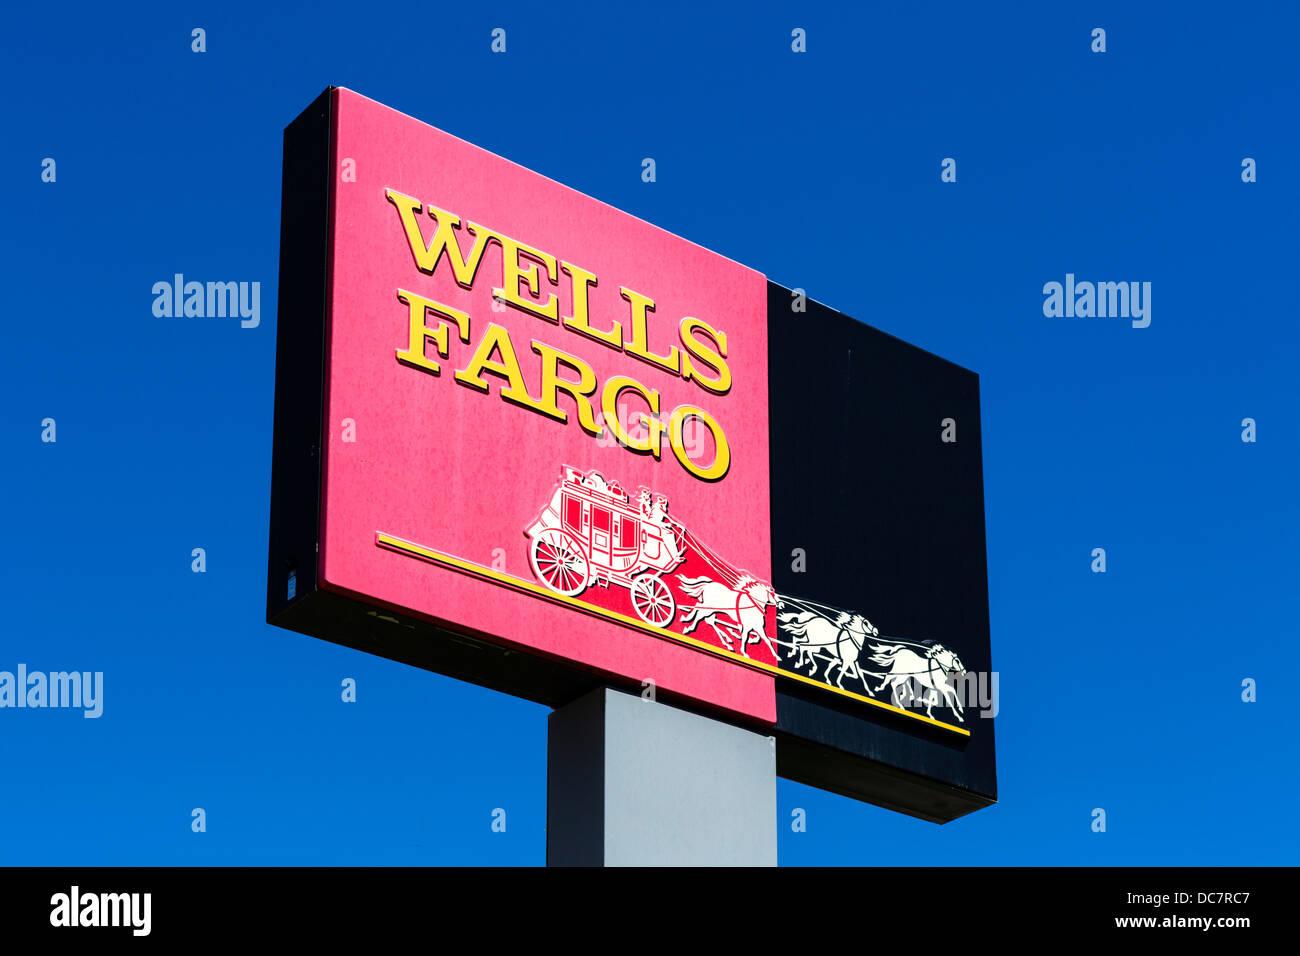 Wells Fargo Bank, Cheyenne, Wyoming, USA Photo Stock